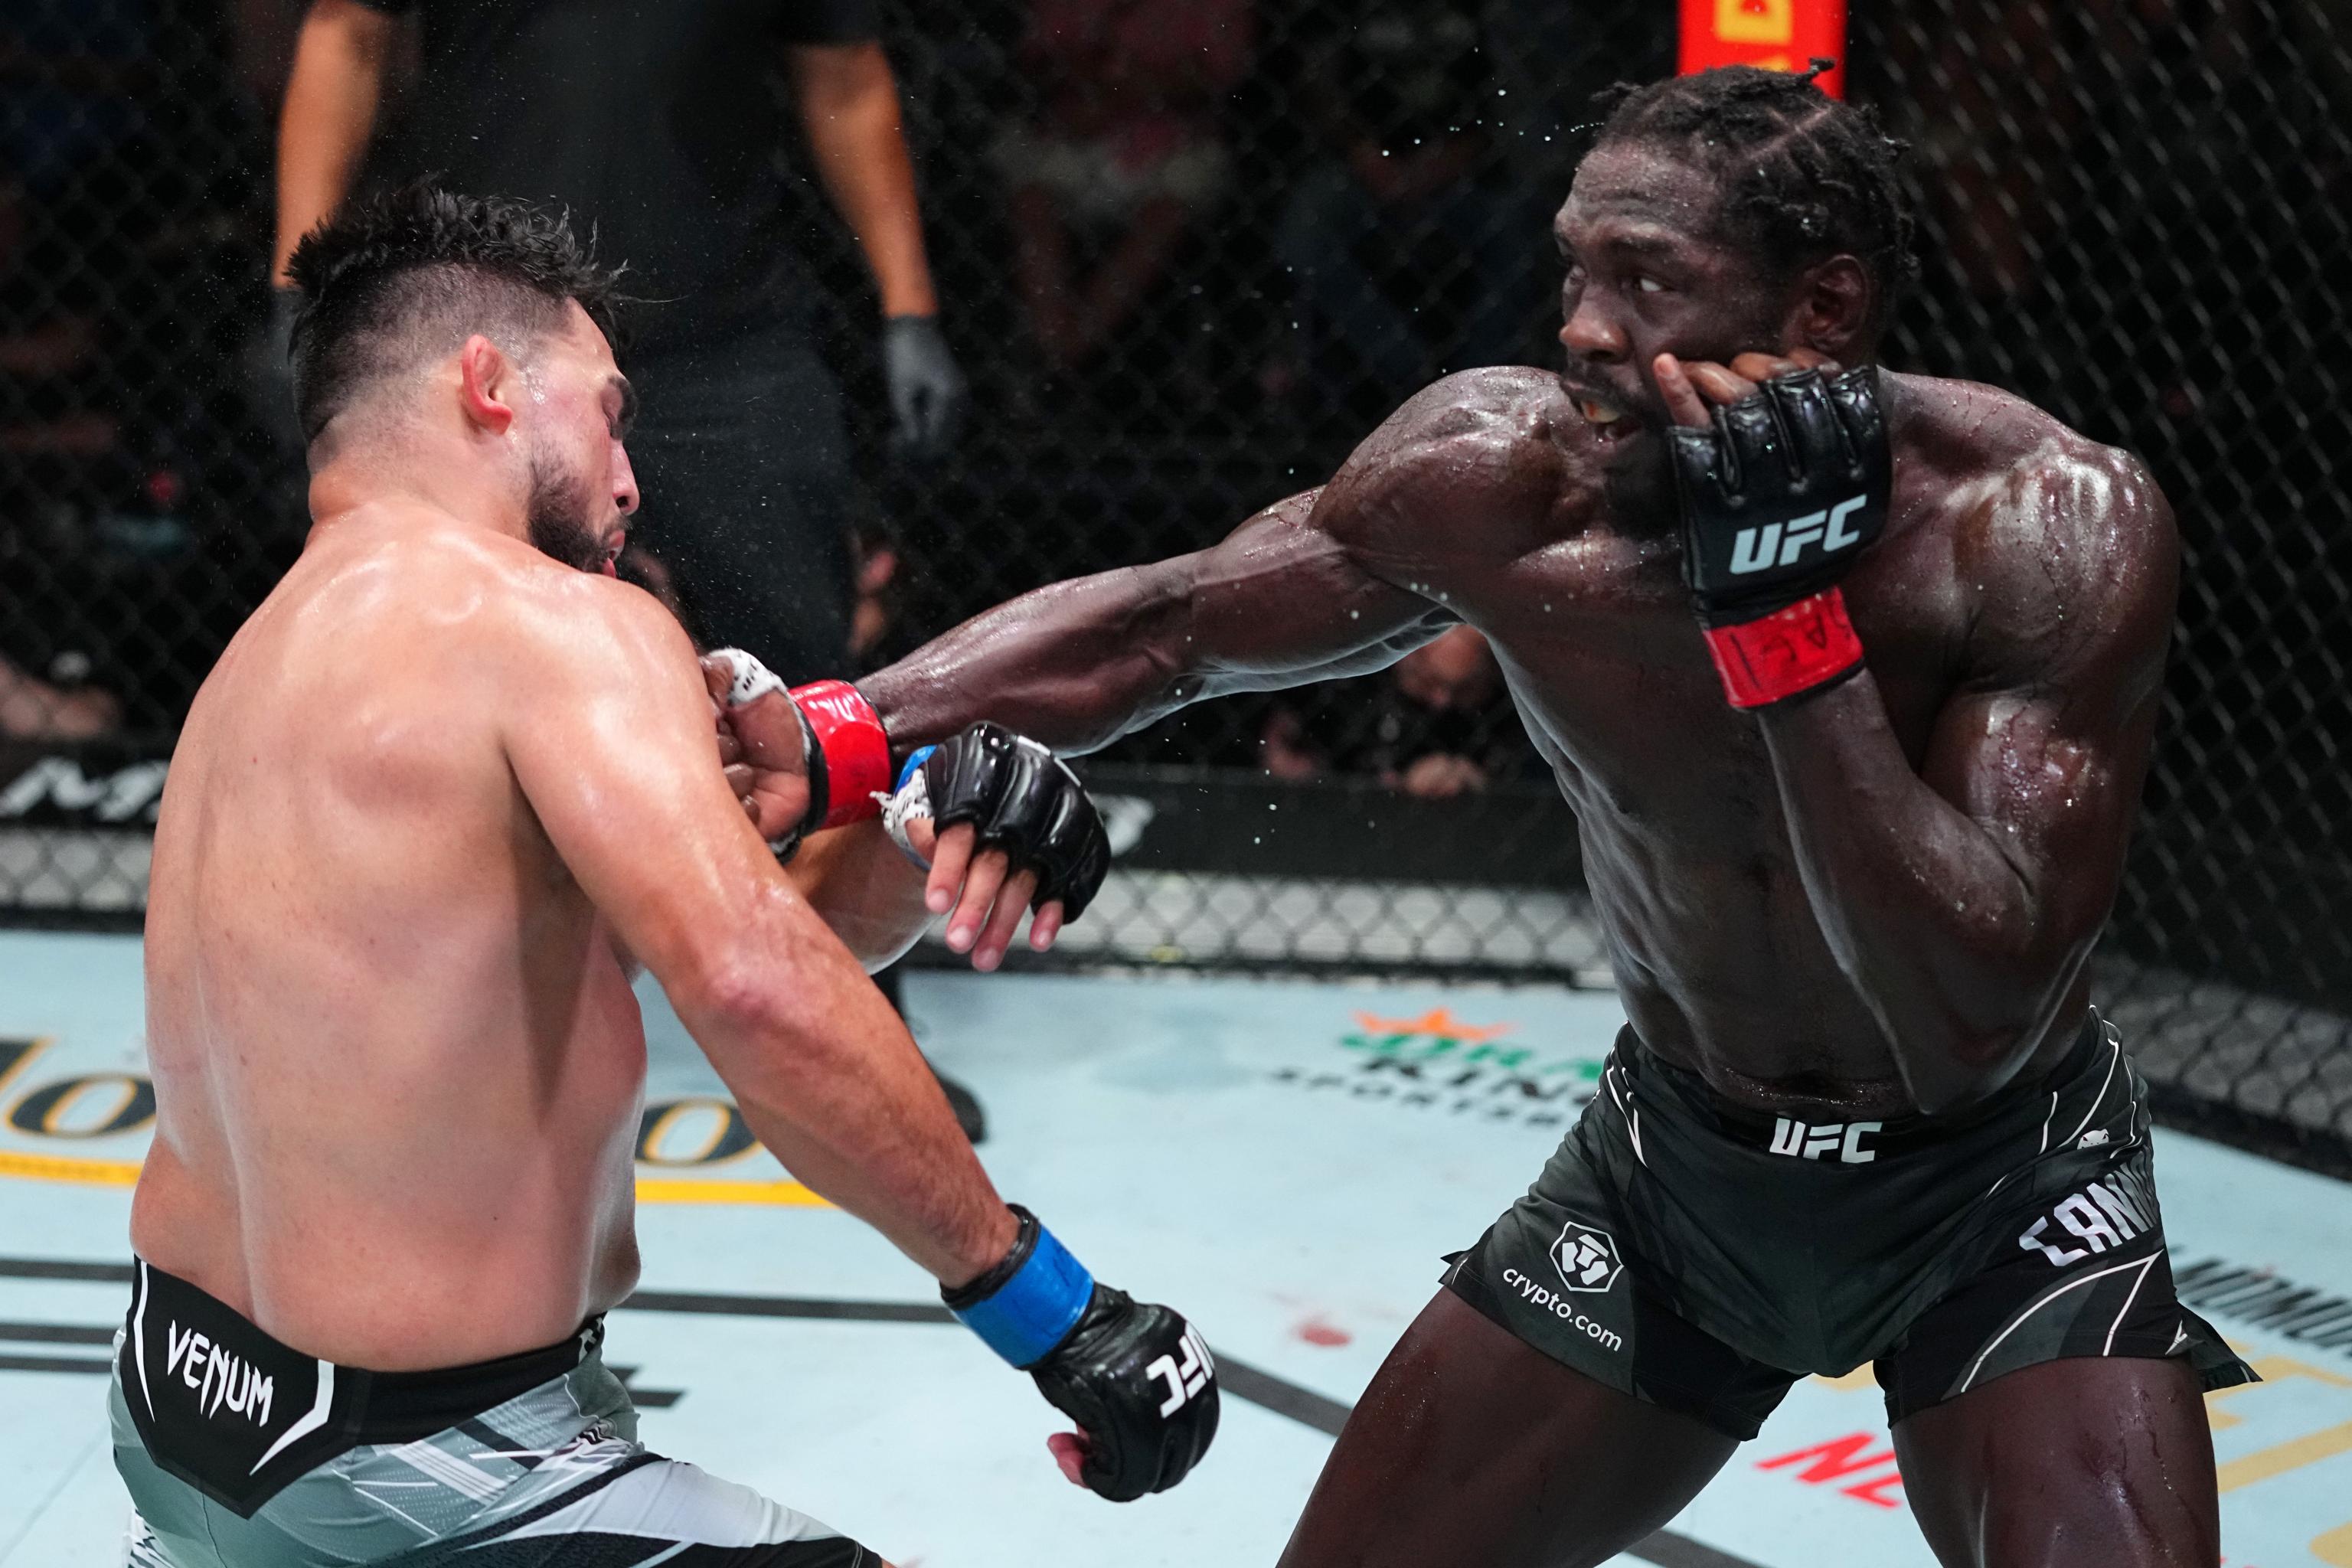 UFC on ESPN 29 Results: Jared Cannonier Beats Kelvin Gastelum